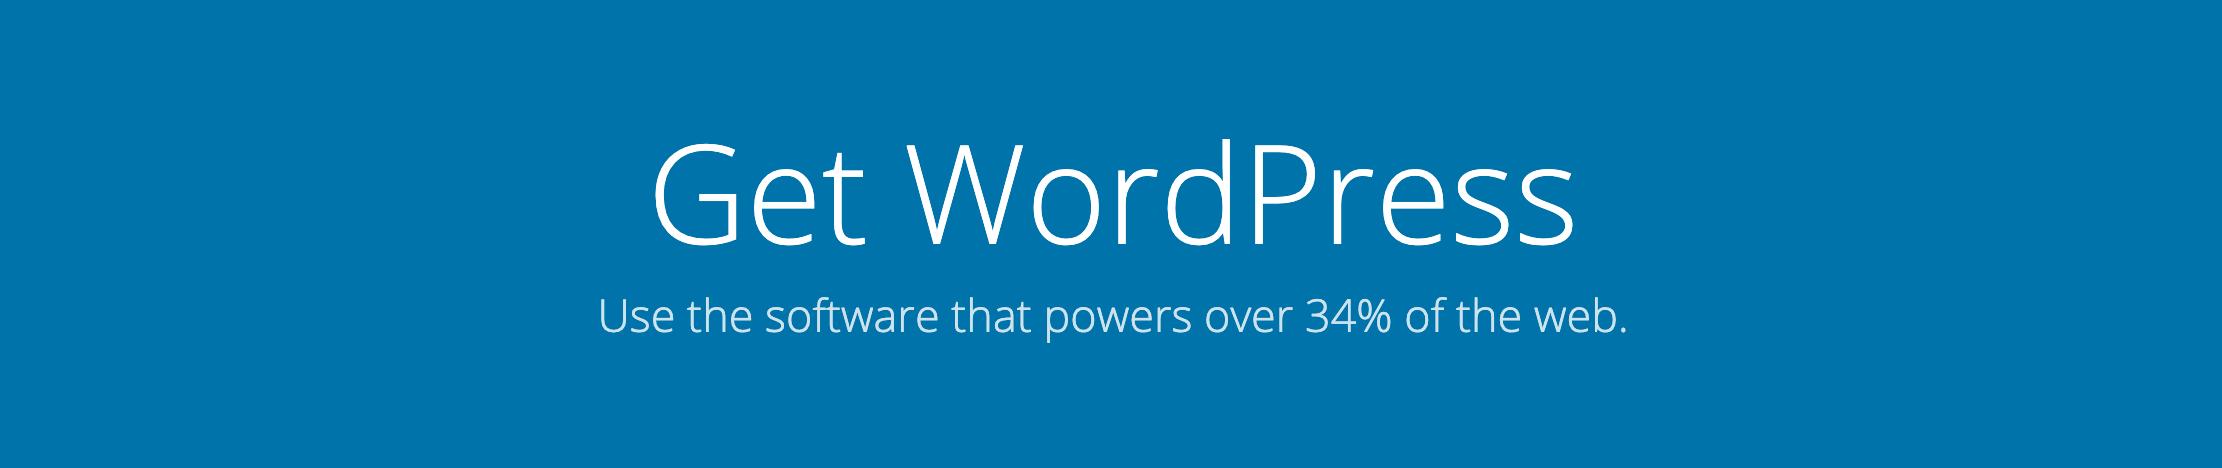 WordPress是一个伟大的志愿者管理系统